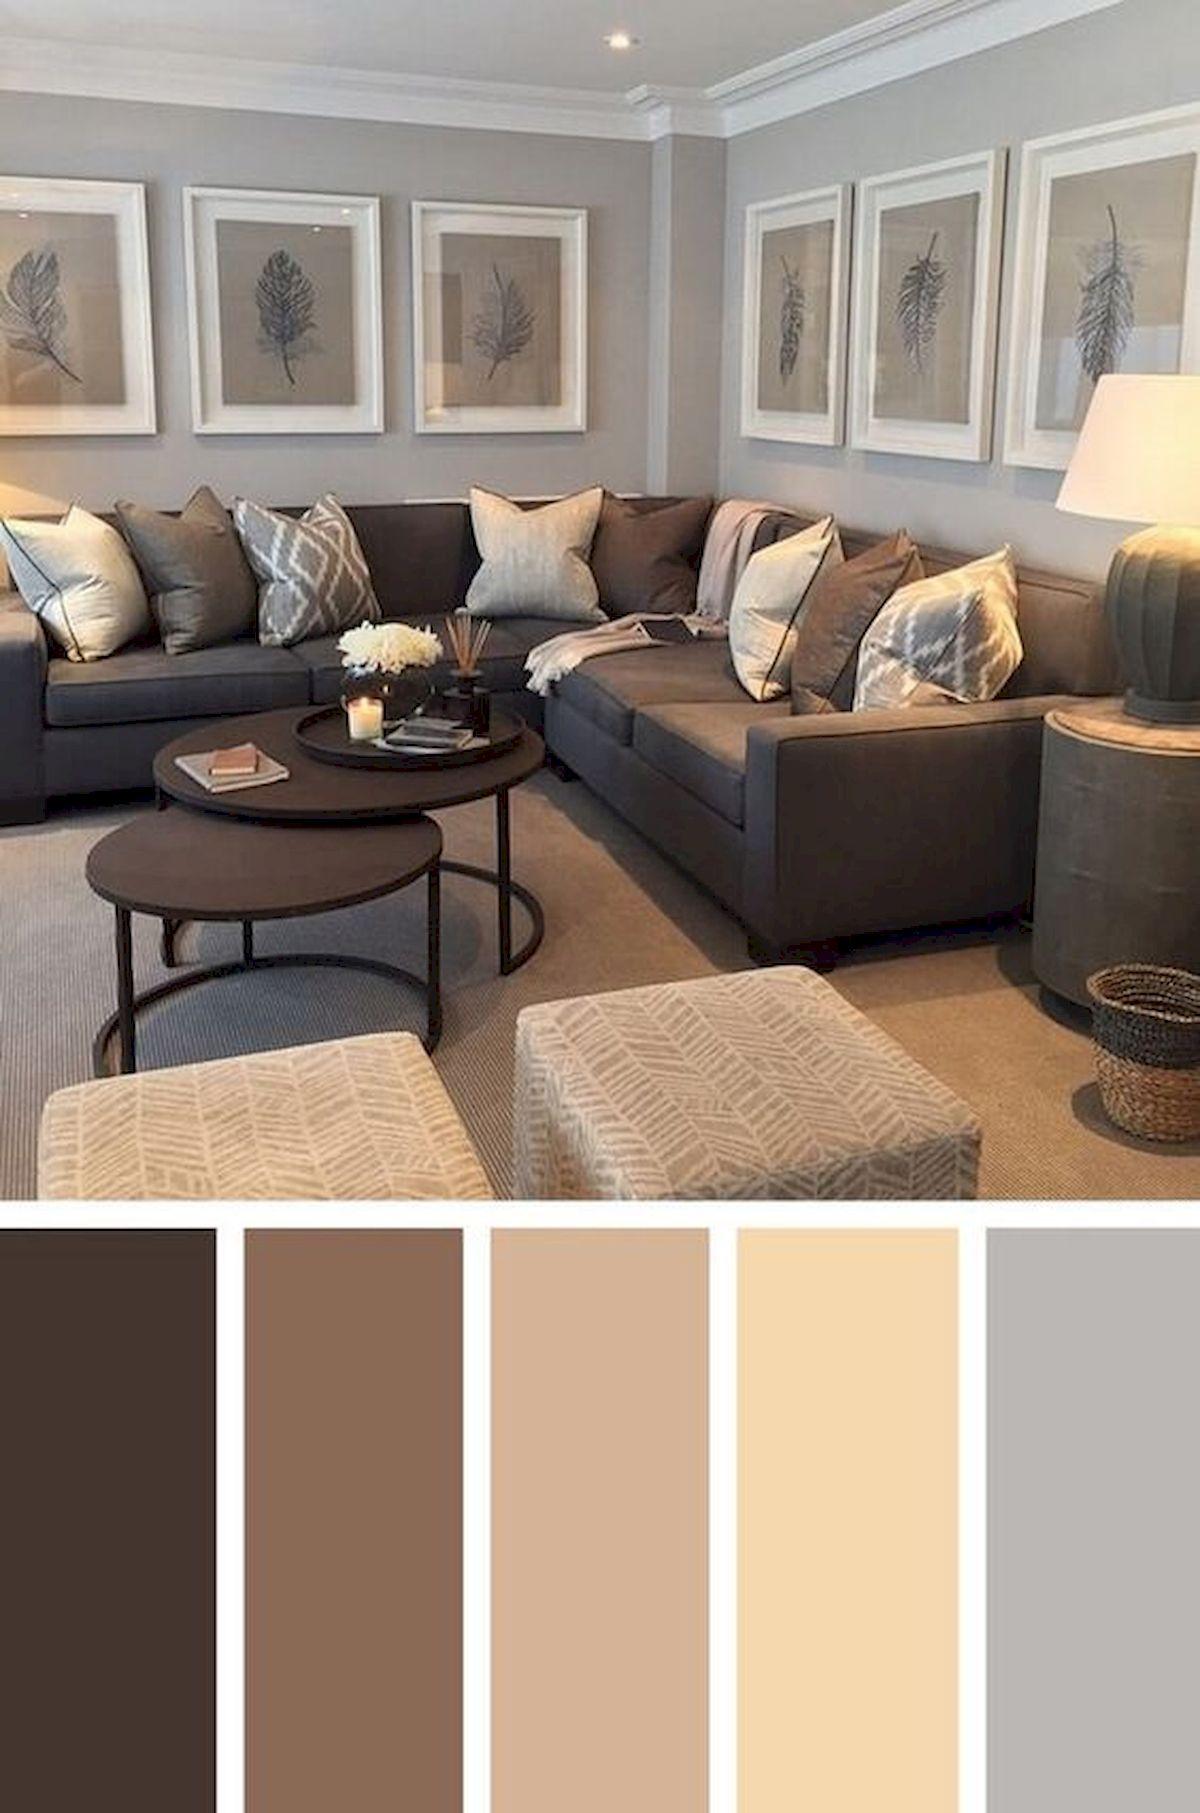 50 Gorgeous Living Room Decor and Design Ideas (29)